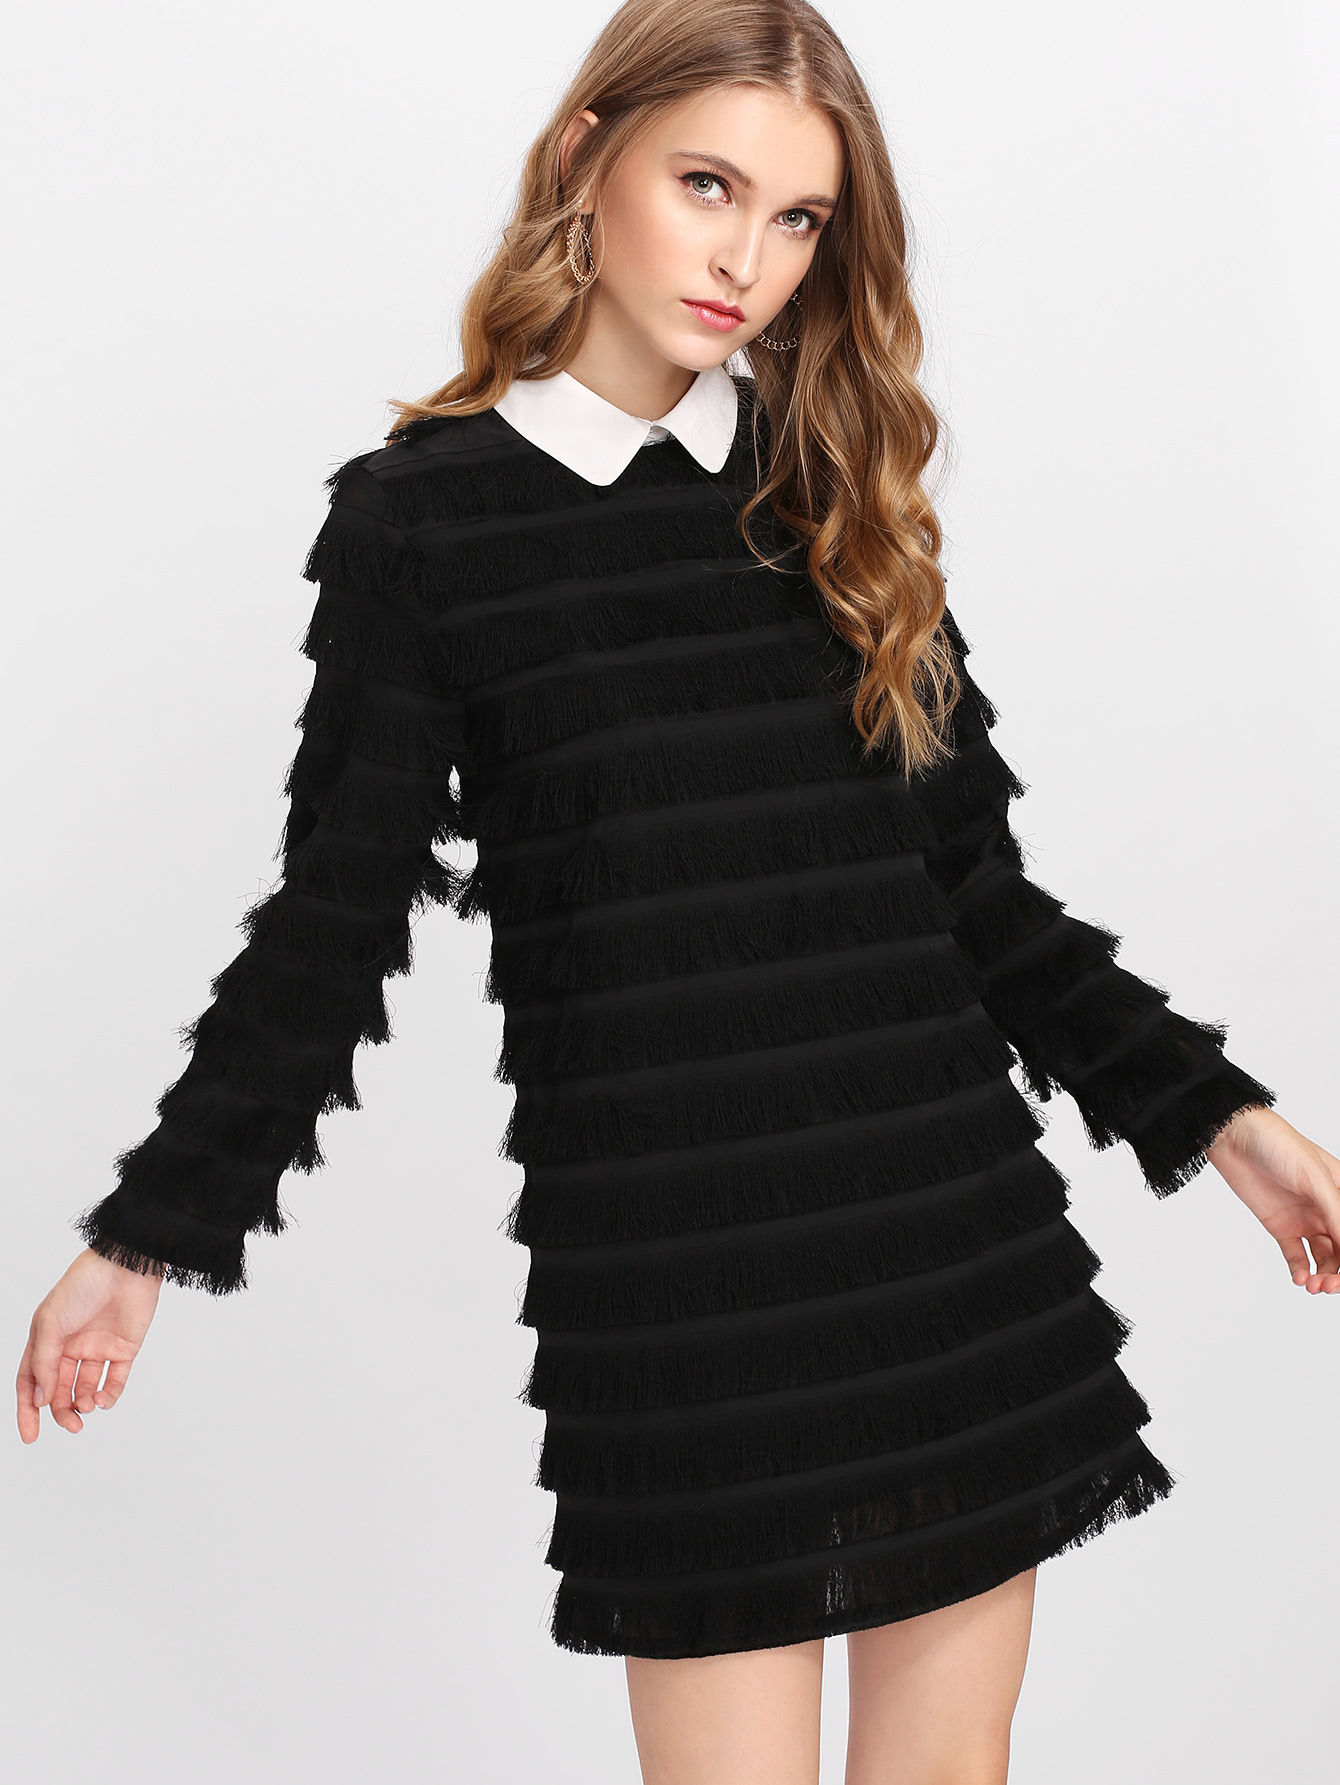 Contrast Collar Layered Fringe Dress dress171114725